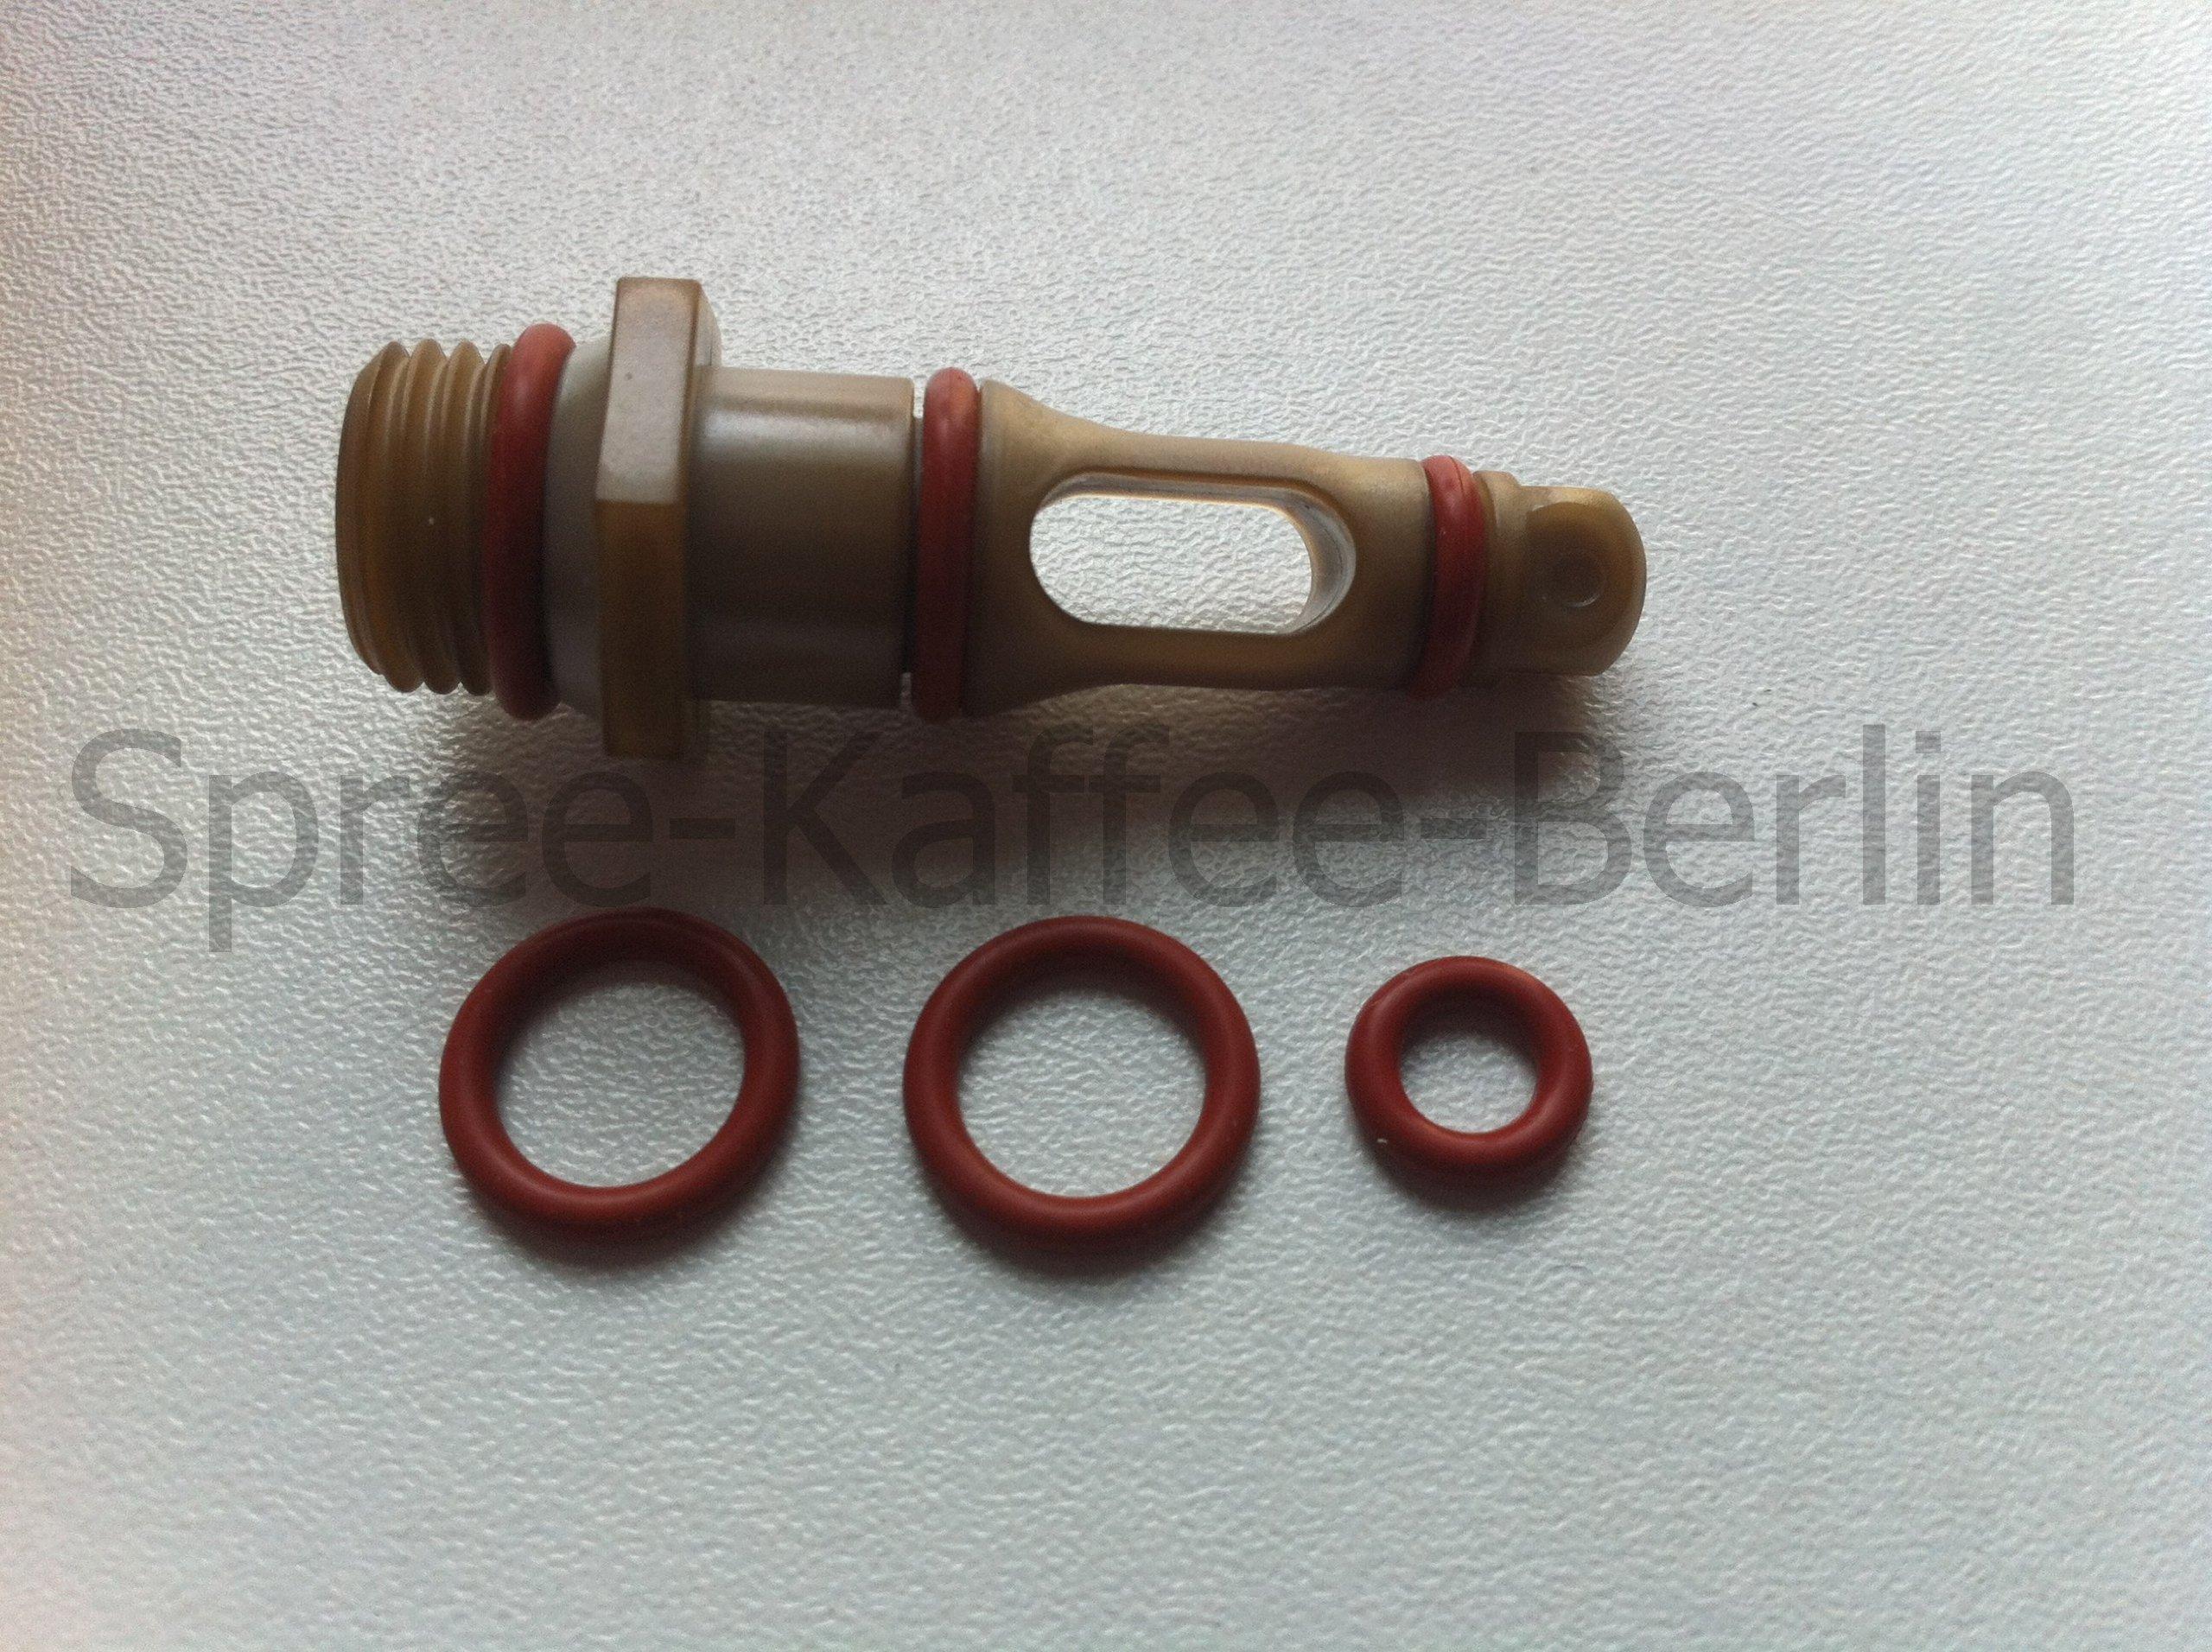 SKB-Dichtungs-Set-AuslaufventilSupportventil-geeignet-fr-Saeco-Spidem-Kaffeevollautomaten-Set-55